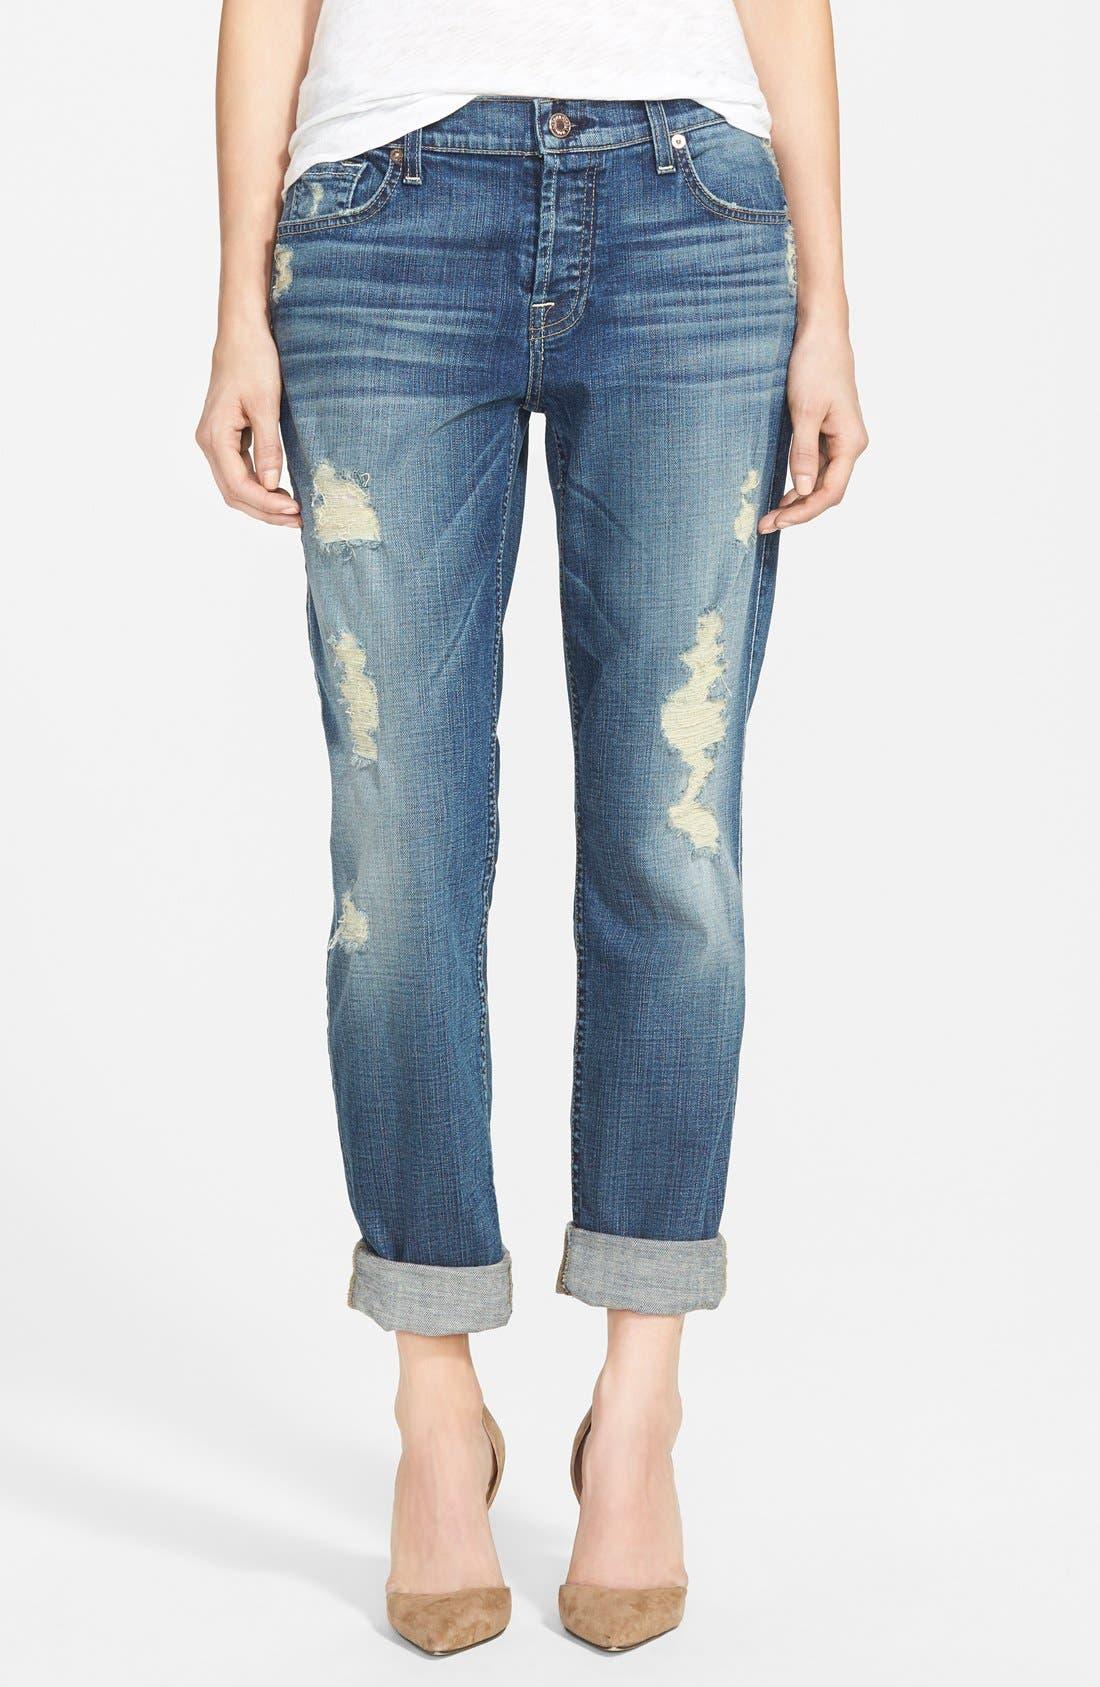 Alternate Image 1 Selected - 7 For All Mankind® 'Josefina' Boyfriend Jeans (Dusty Vintage Blue)